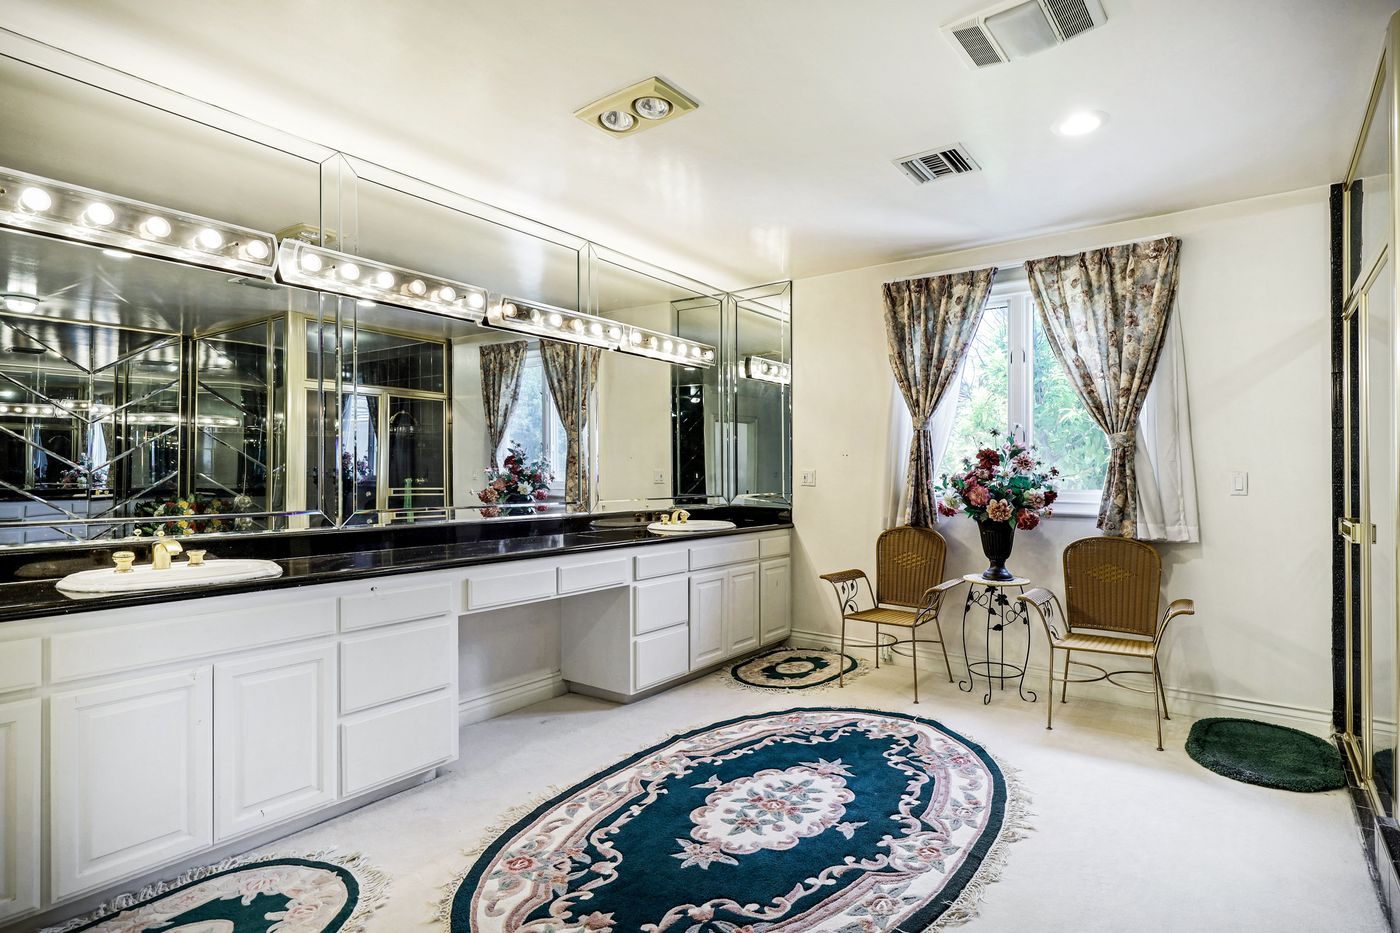 real-estate-photography-2245 Kingsbridge Ct-San Dimas-91773-airbnb-rental-interior-design-photographer-kasi-hyrapett-34